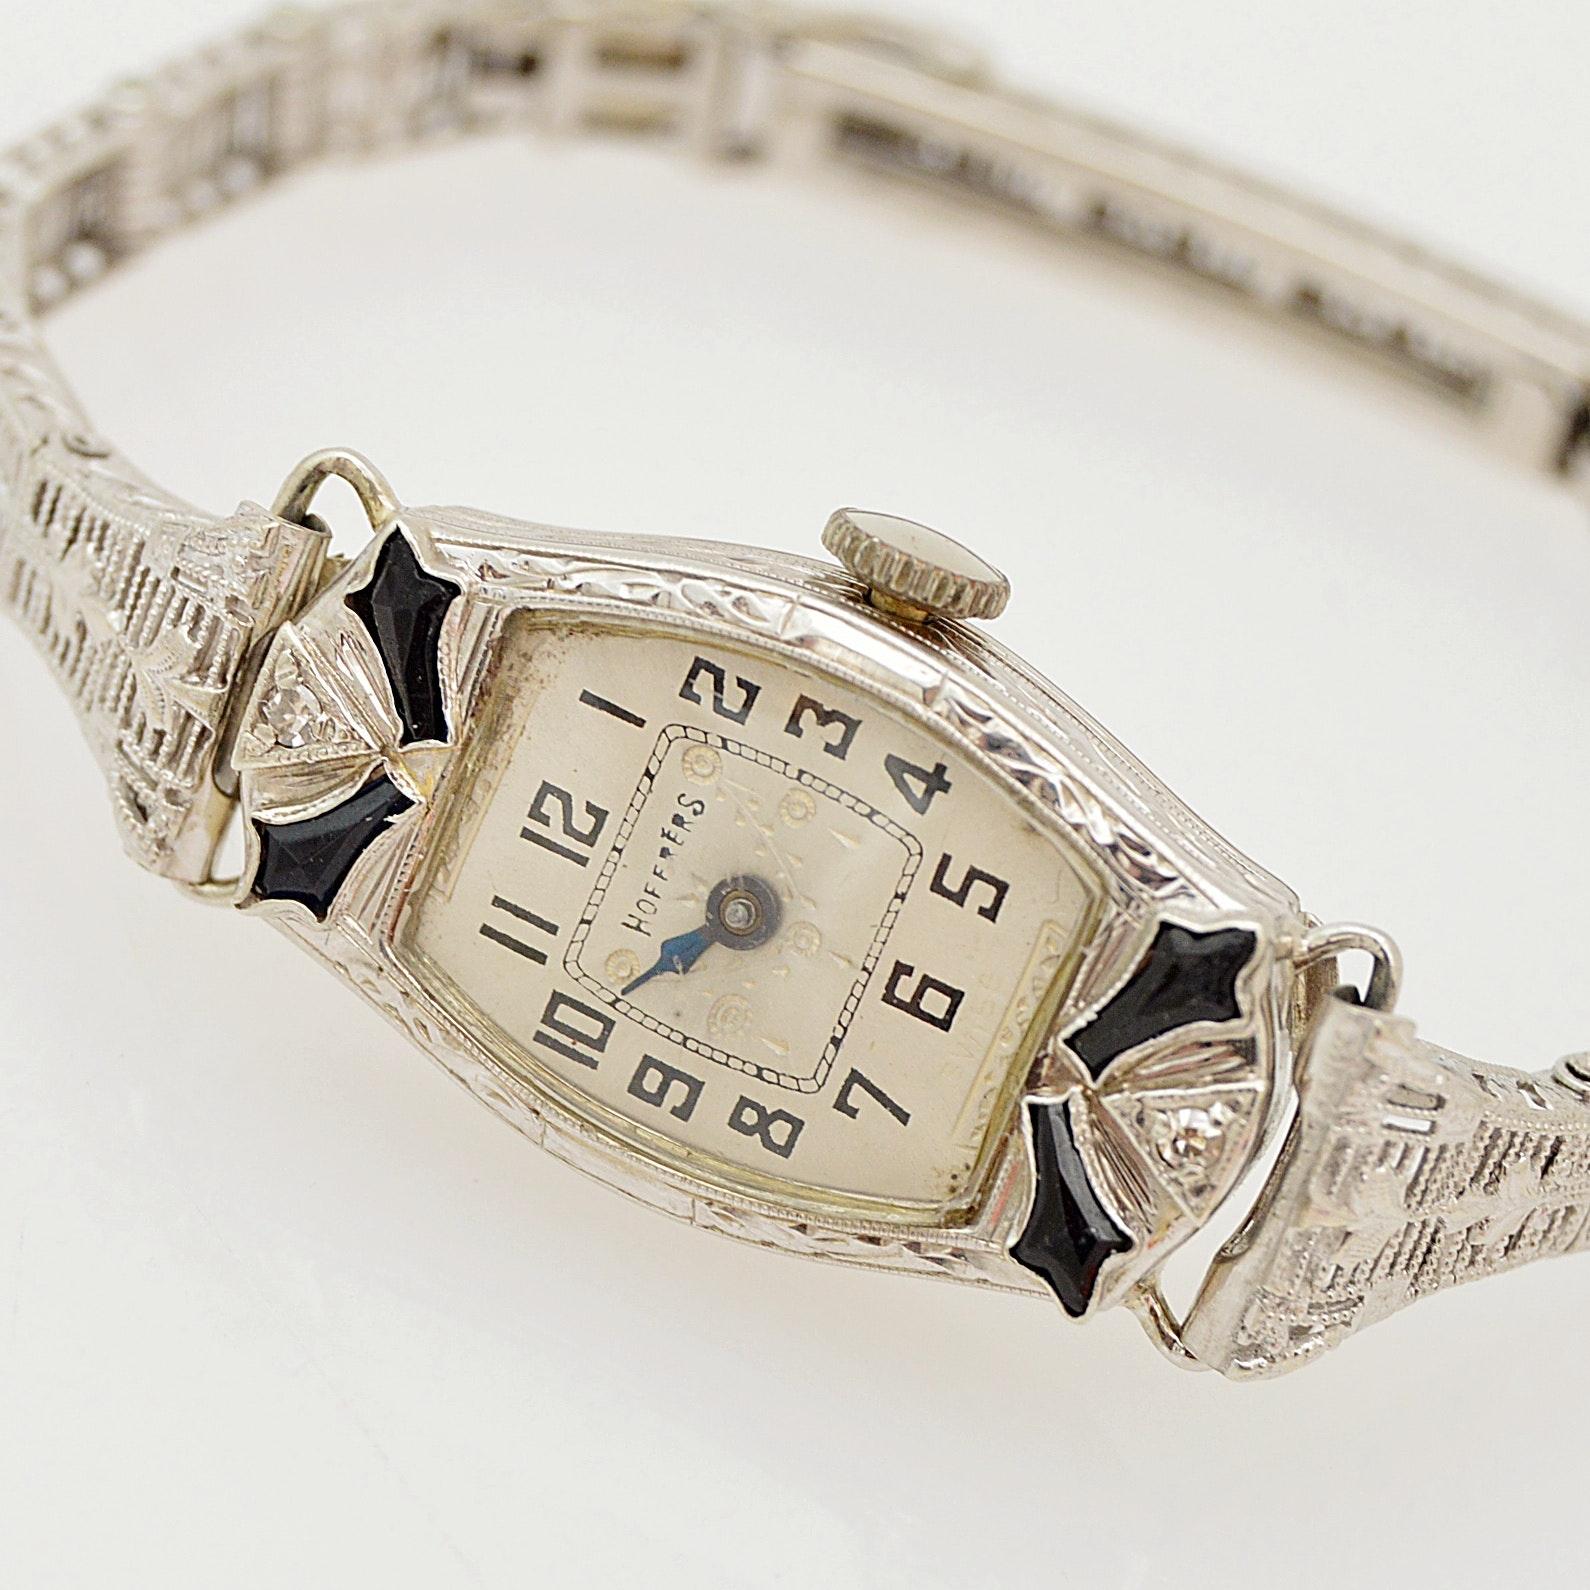 Art Deco Hoffres 14K White Gold, Diamond and Blue Glass Wristwatch